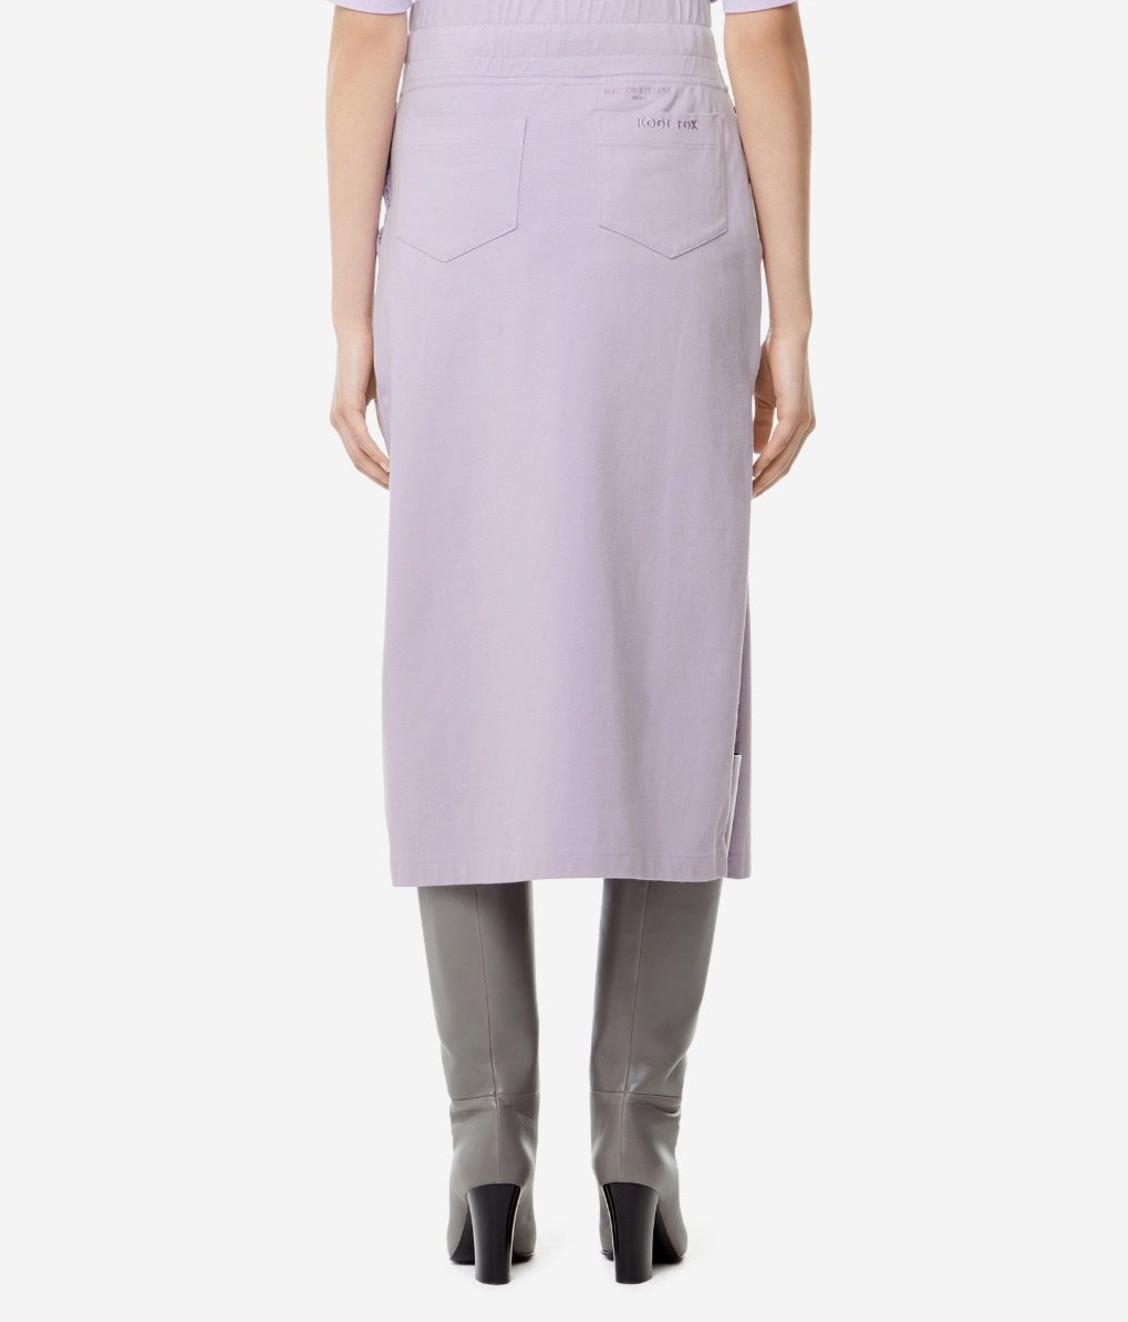 Maison Kitsune Kitsune Sweat Skirt Lilac